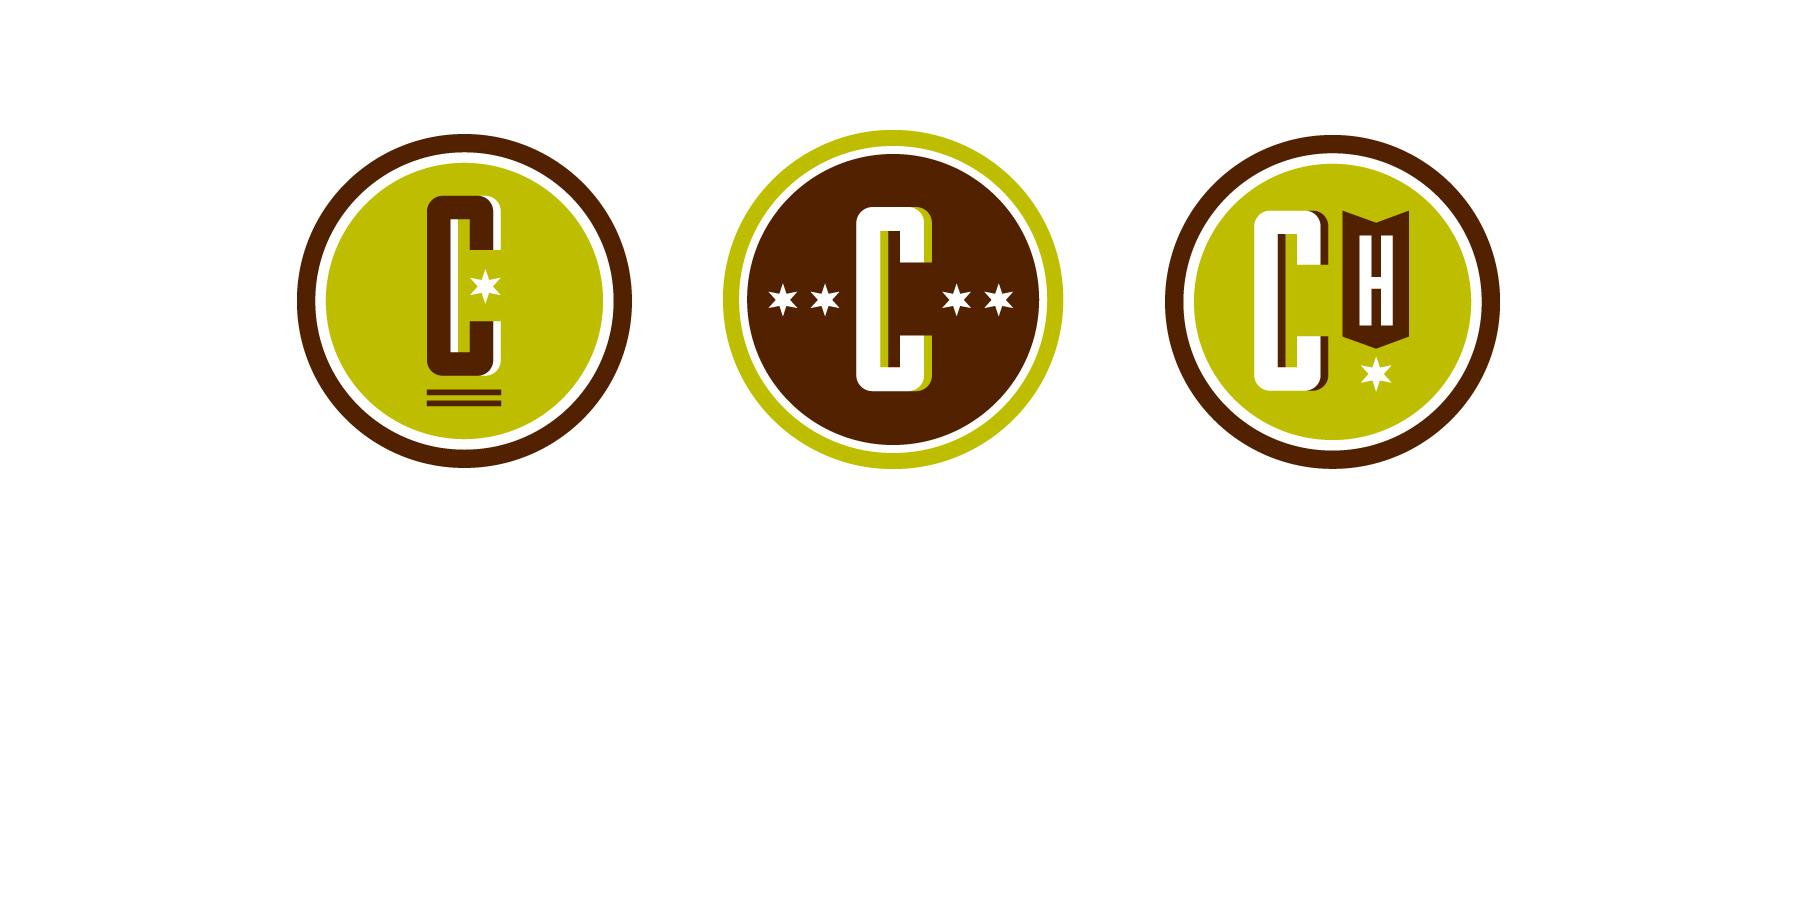 Logos_6x4_CH_Alt2.jpg